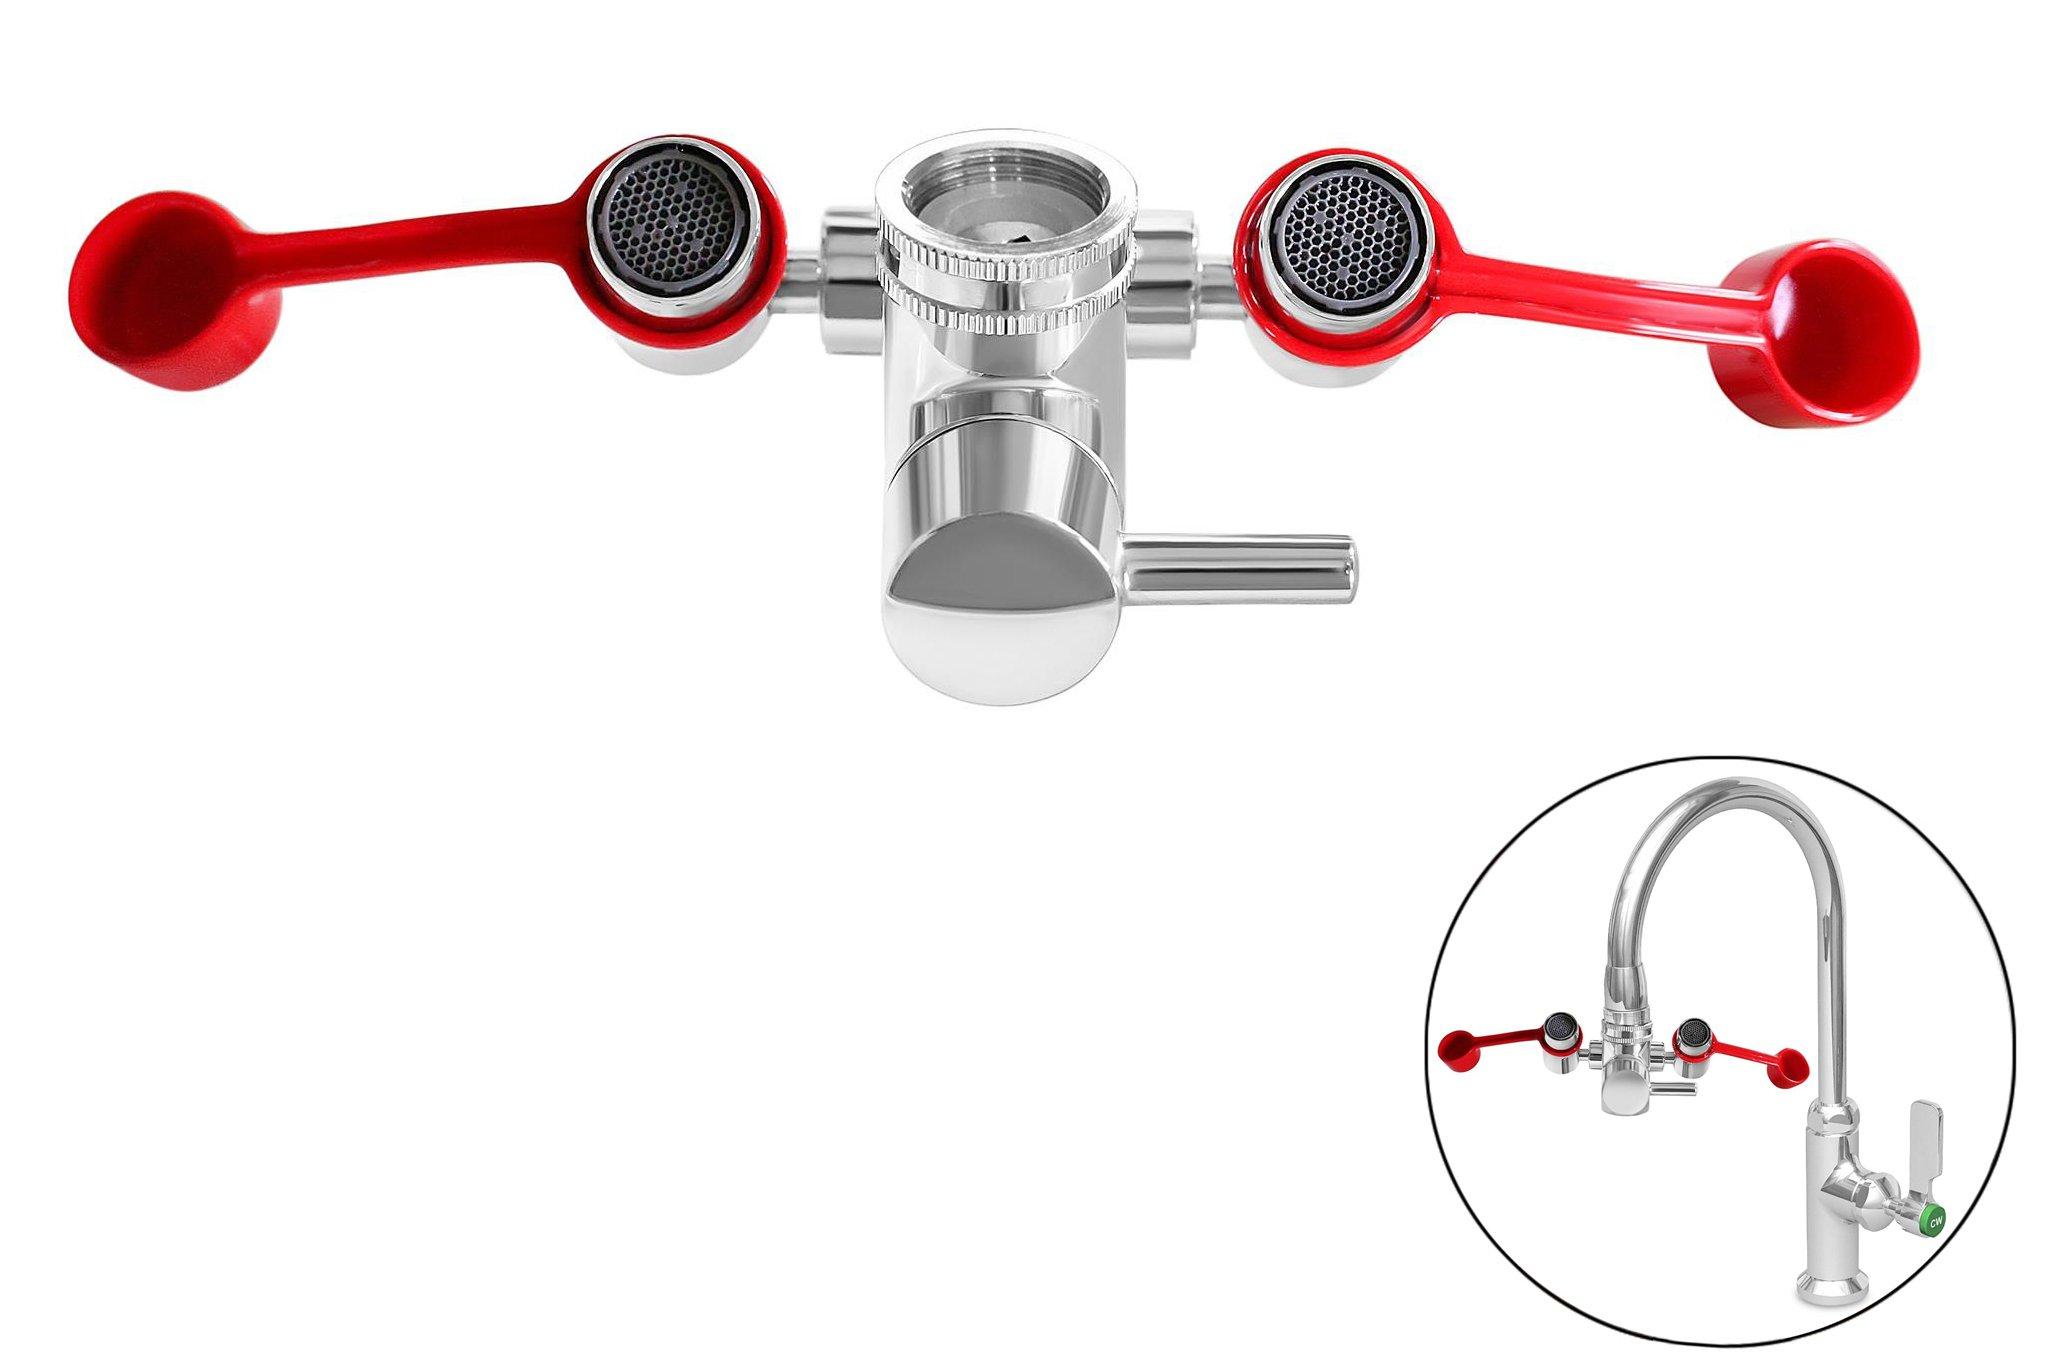 SmarterFresh Faucet Mounted Eyewash Station, Emergency Eye Wash Unit for Sink Attachment - Sink Mount Eye Flush Shower